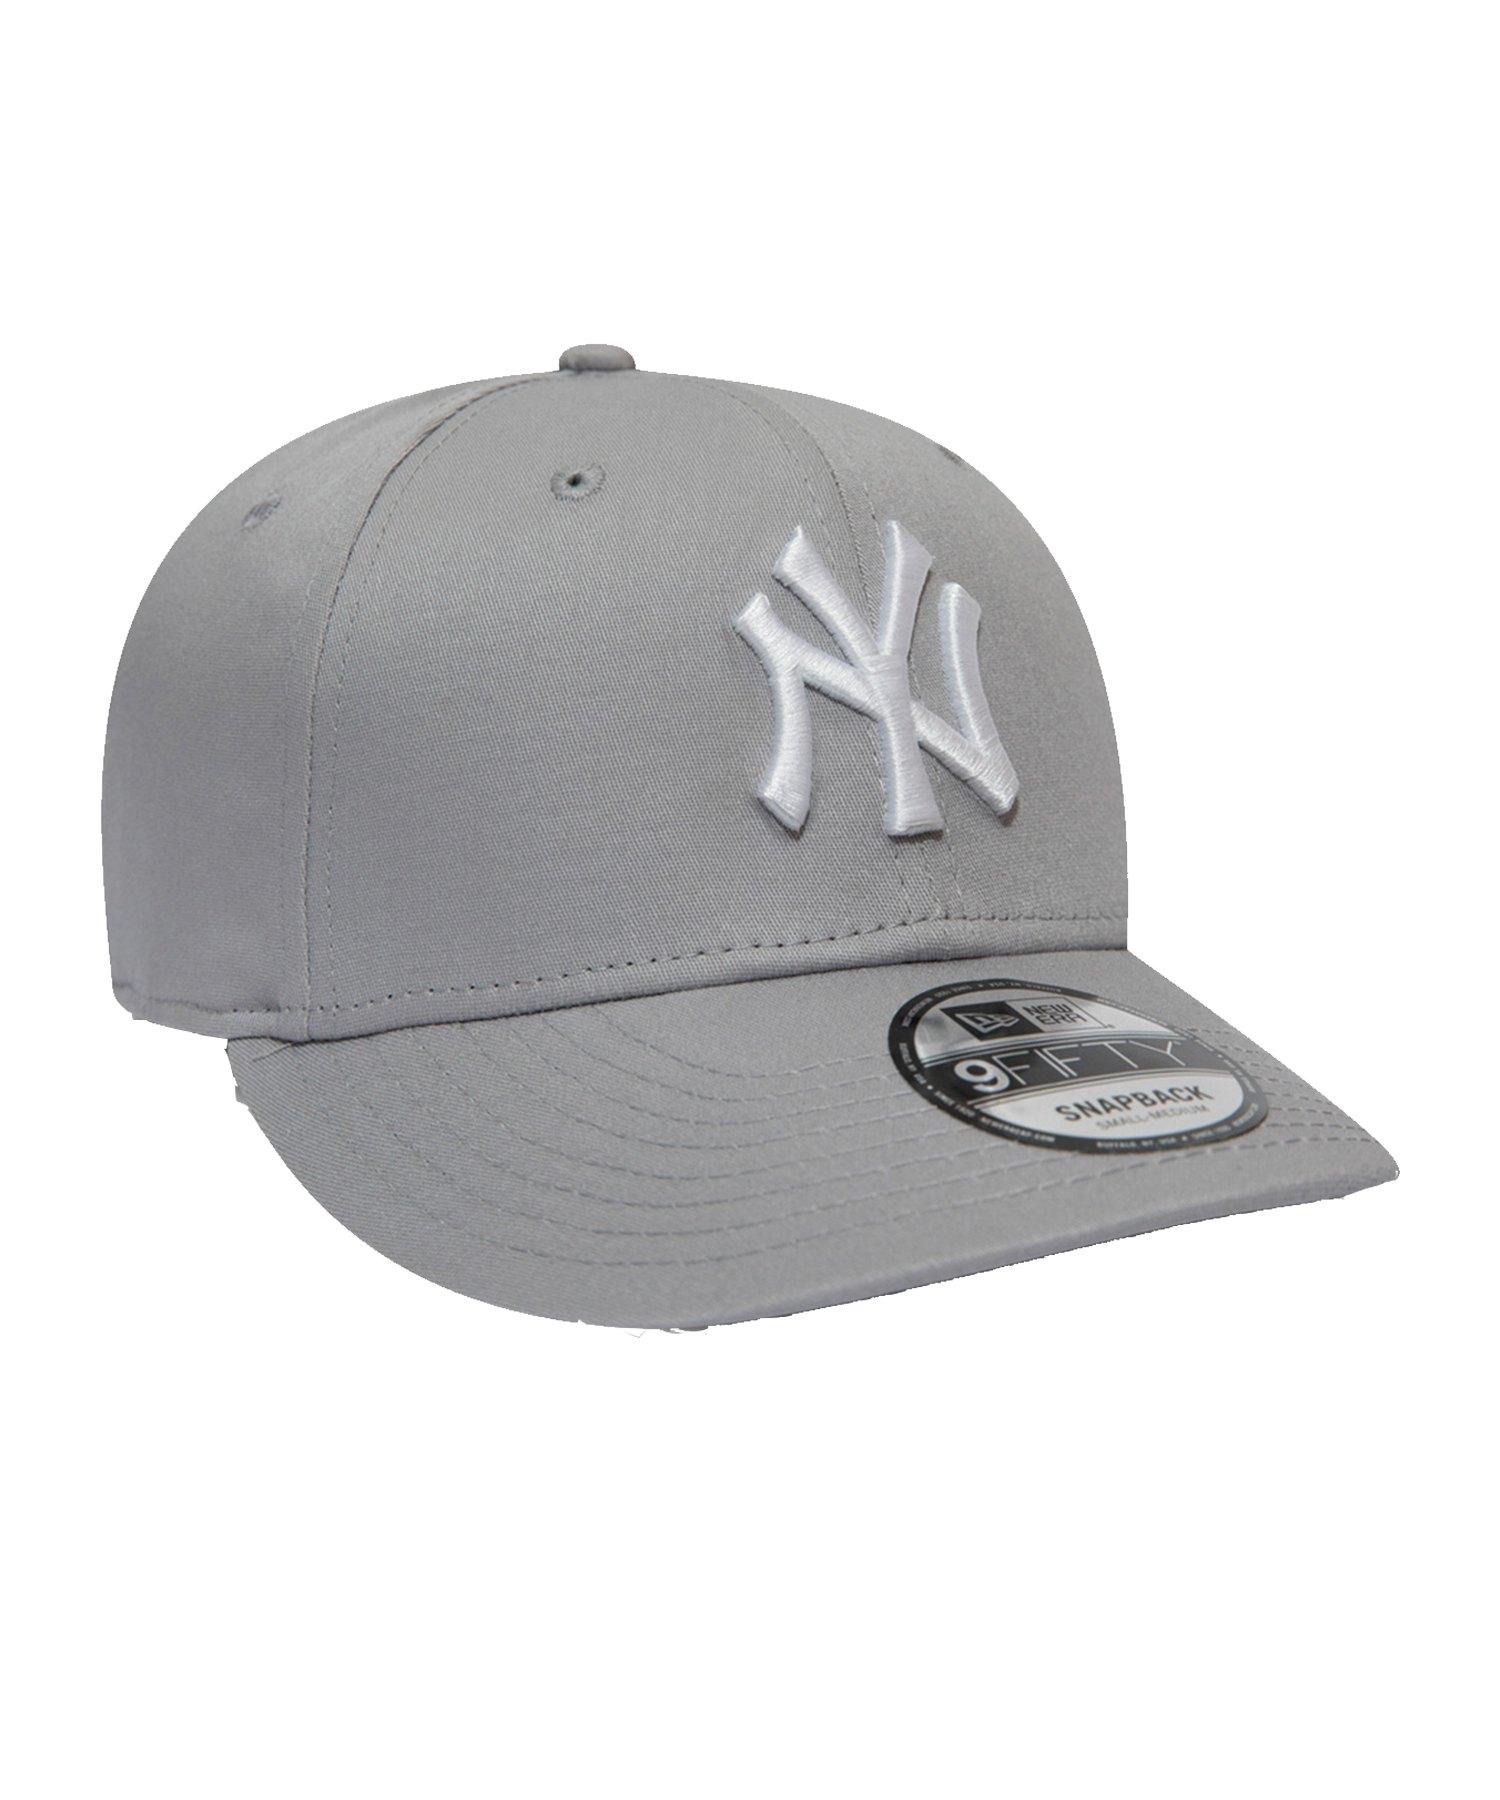 New Era NY Yankees 9Fifty Cap Grau - grau